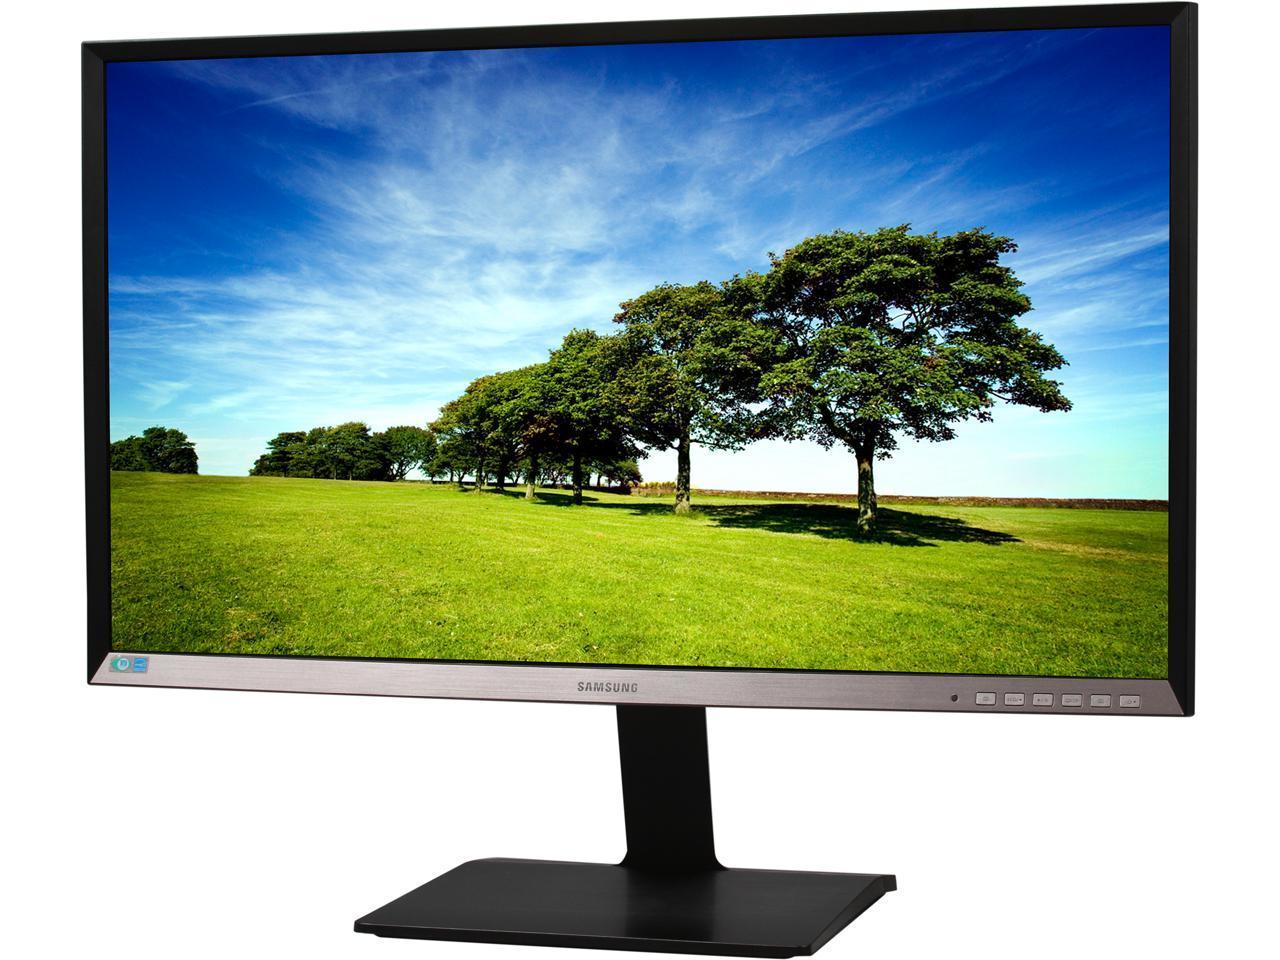 SAMSUNG S32D850T 32 inch (2560 x 1440) WQHD Dual HDMI Widescreen LED Backlight LCD Monitor